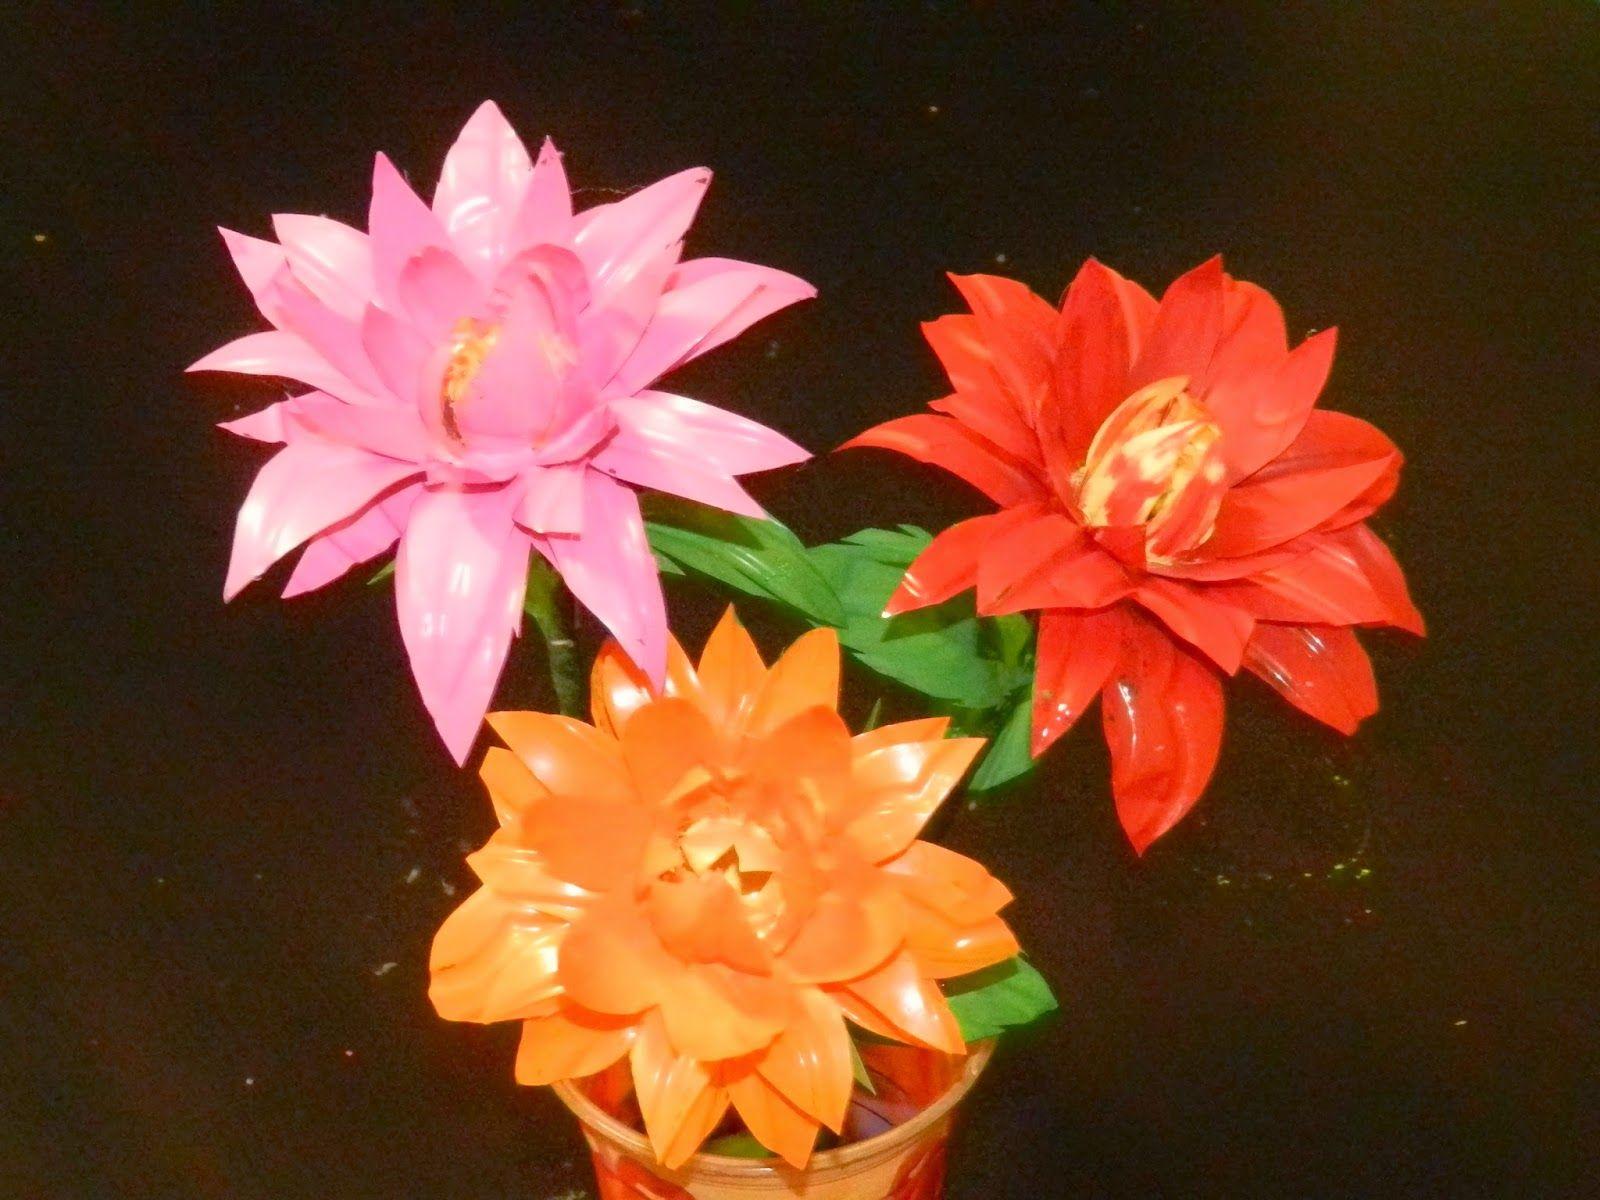 Creative DIY crafts: Dahlia flowers with waste water bottles!